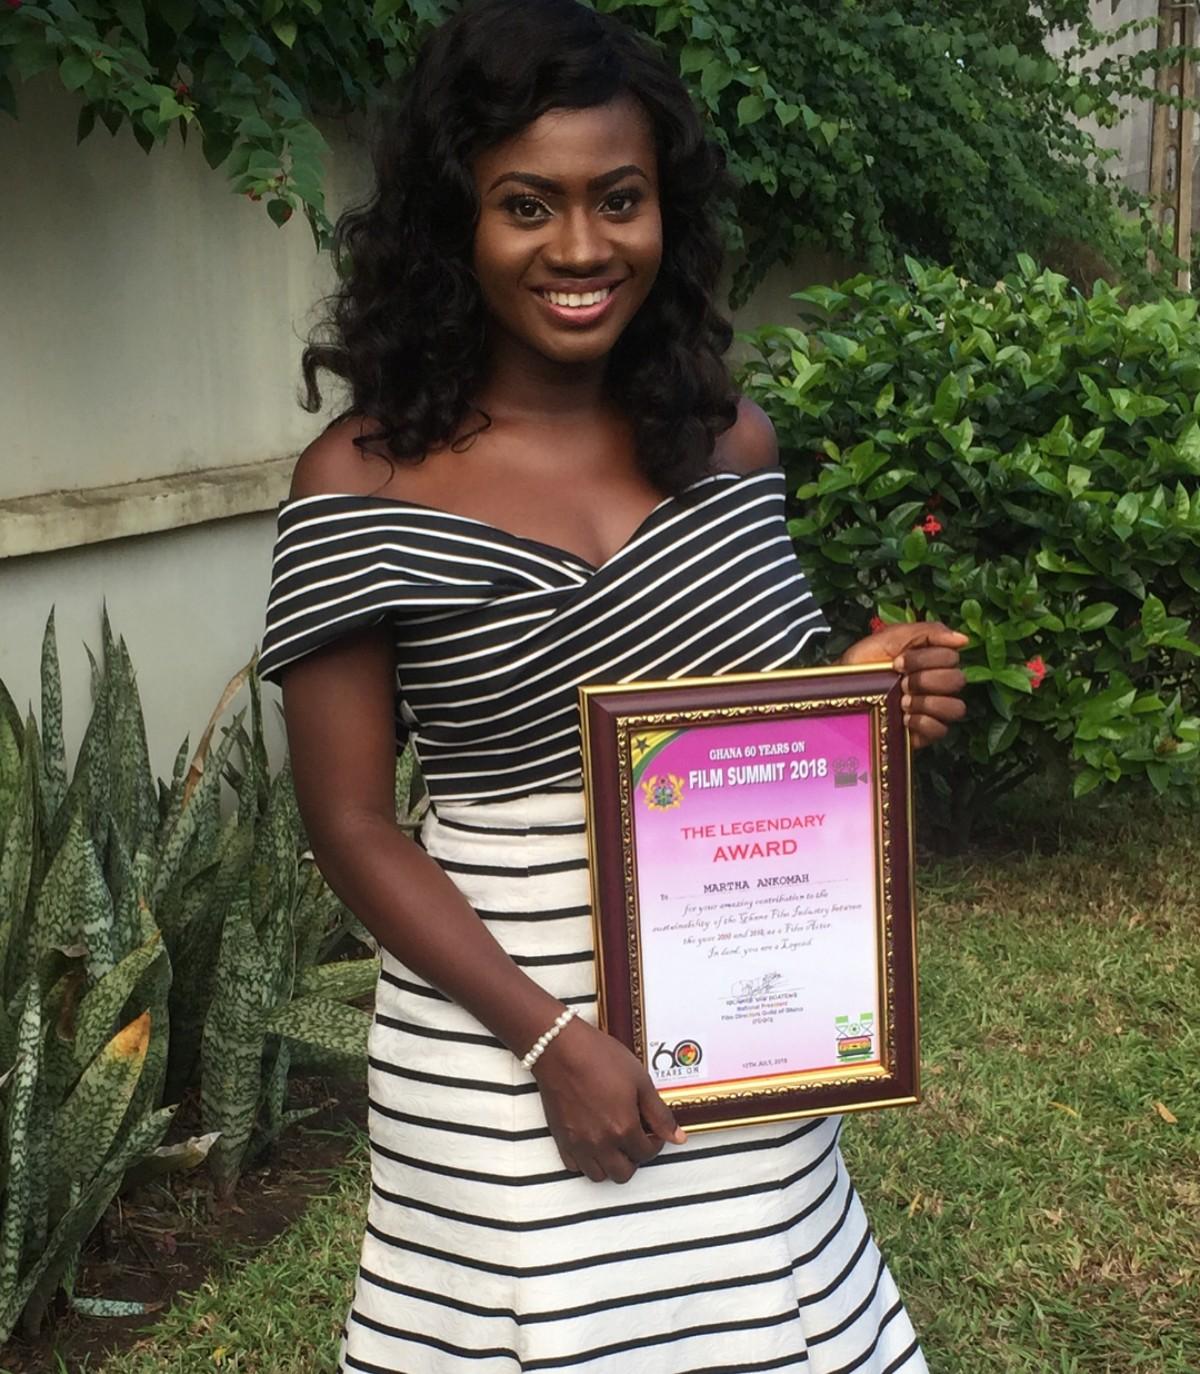 The Legendary Award Ghana 60 Years On Film Summit (3)